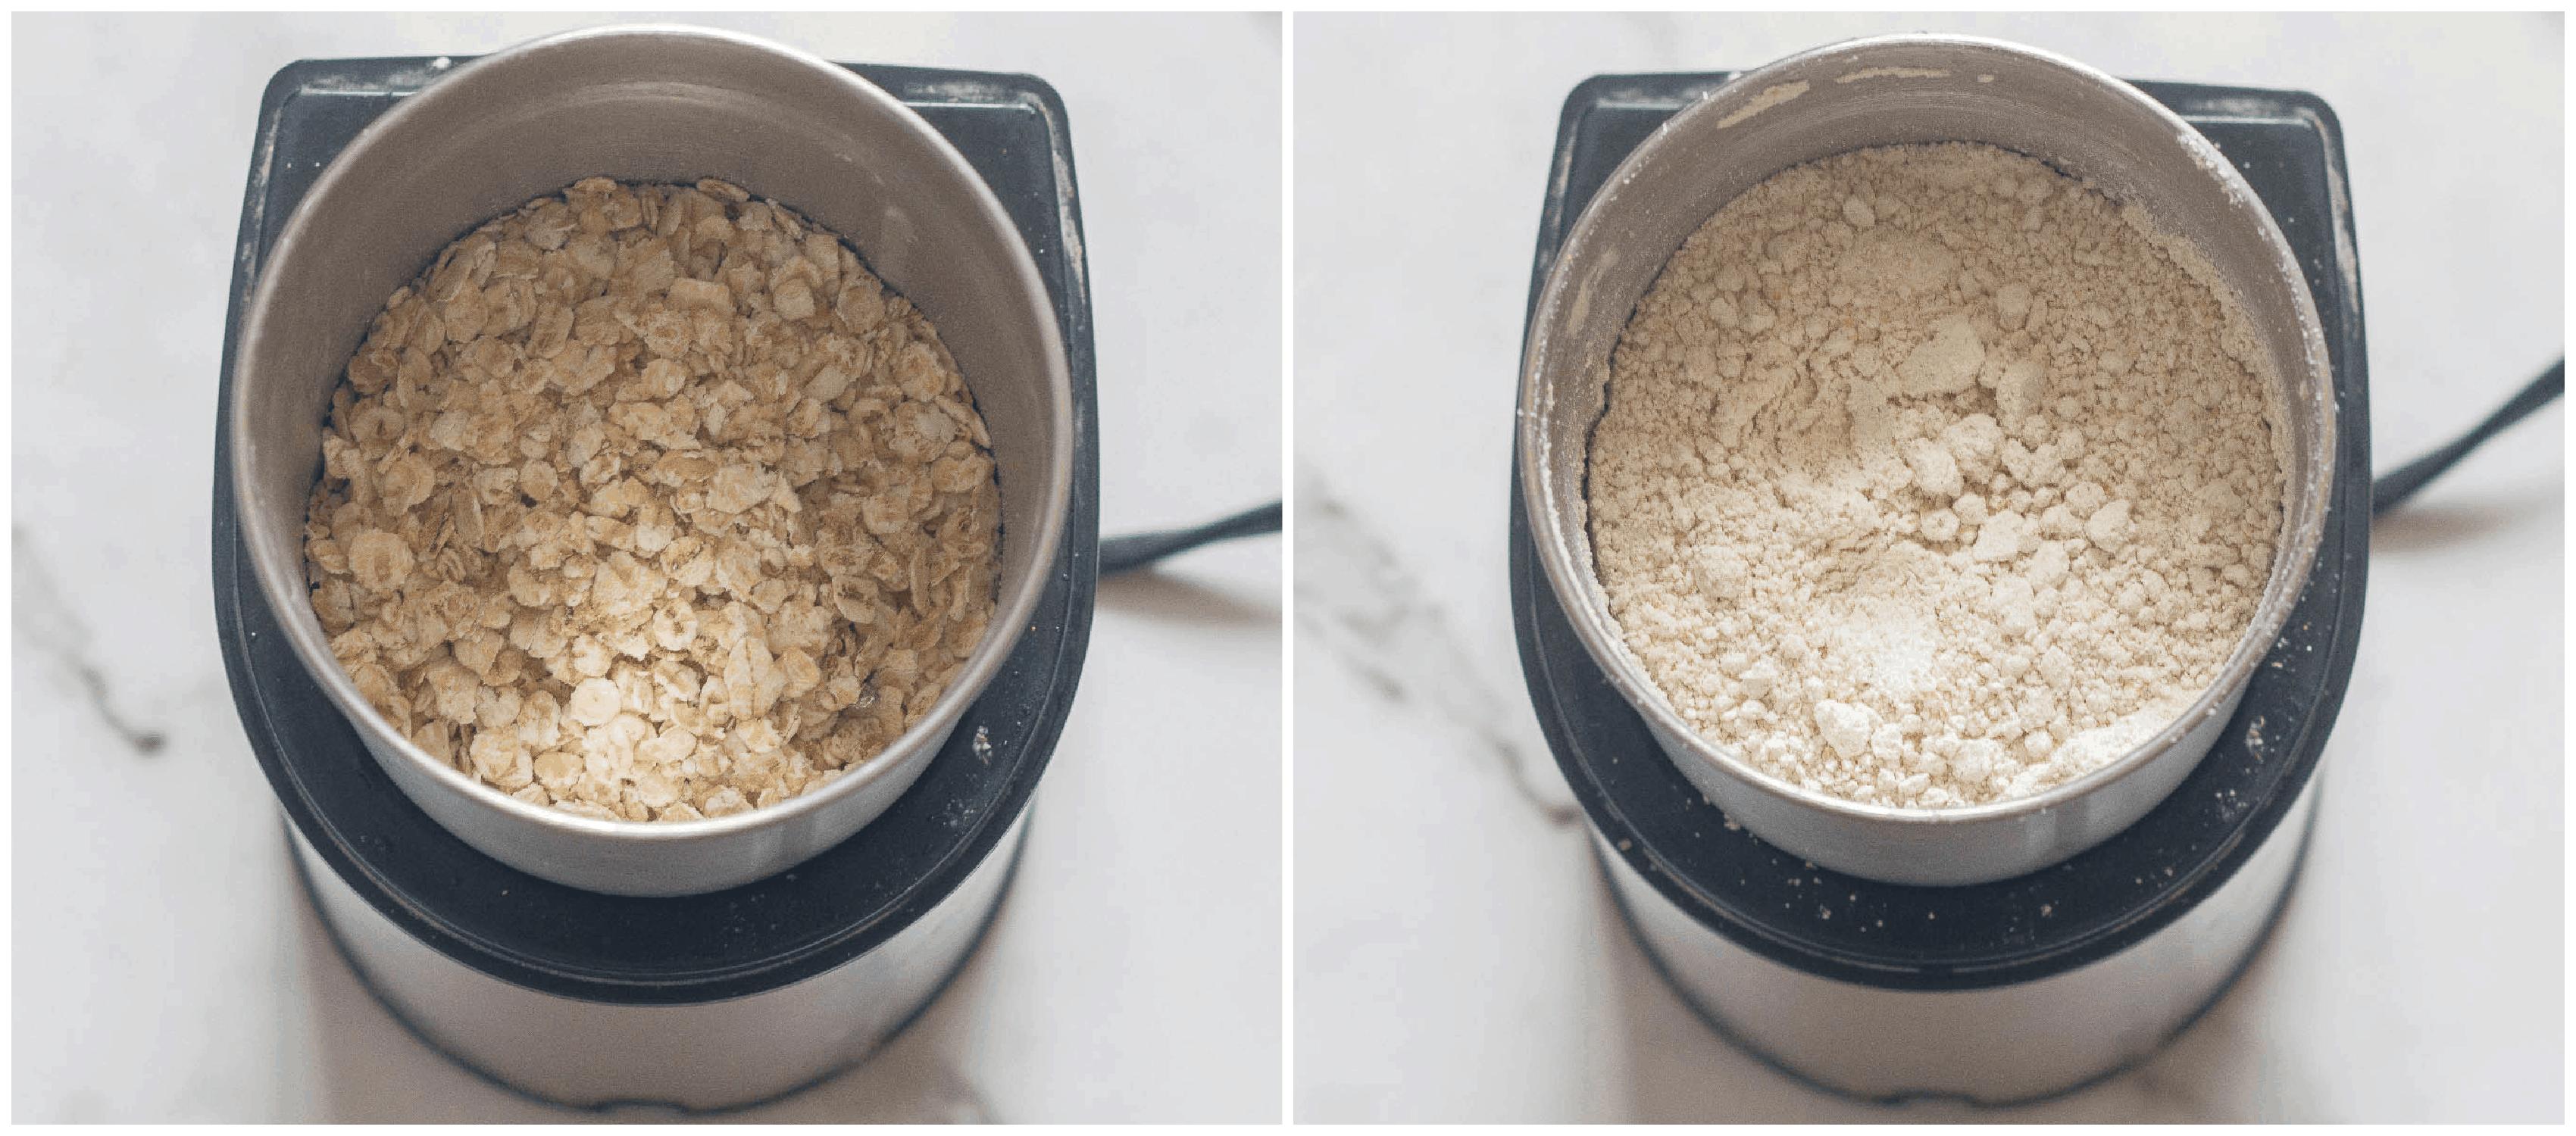 Making the oat flour